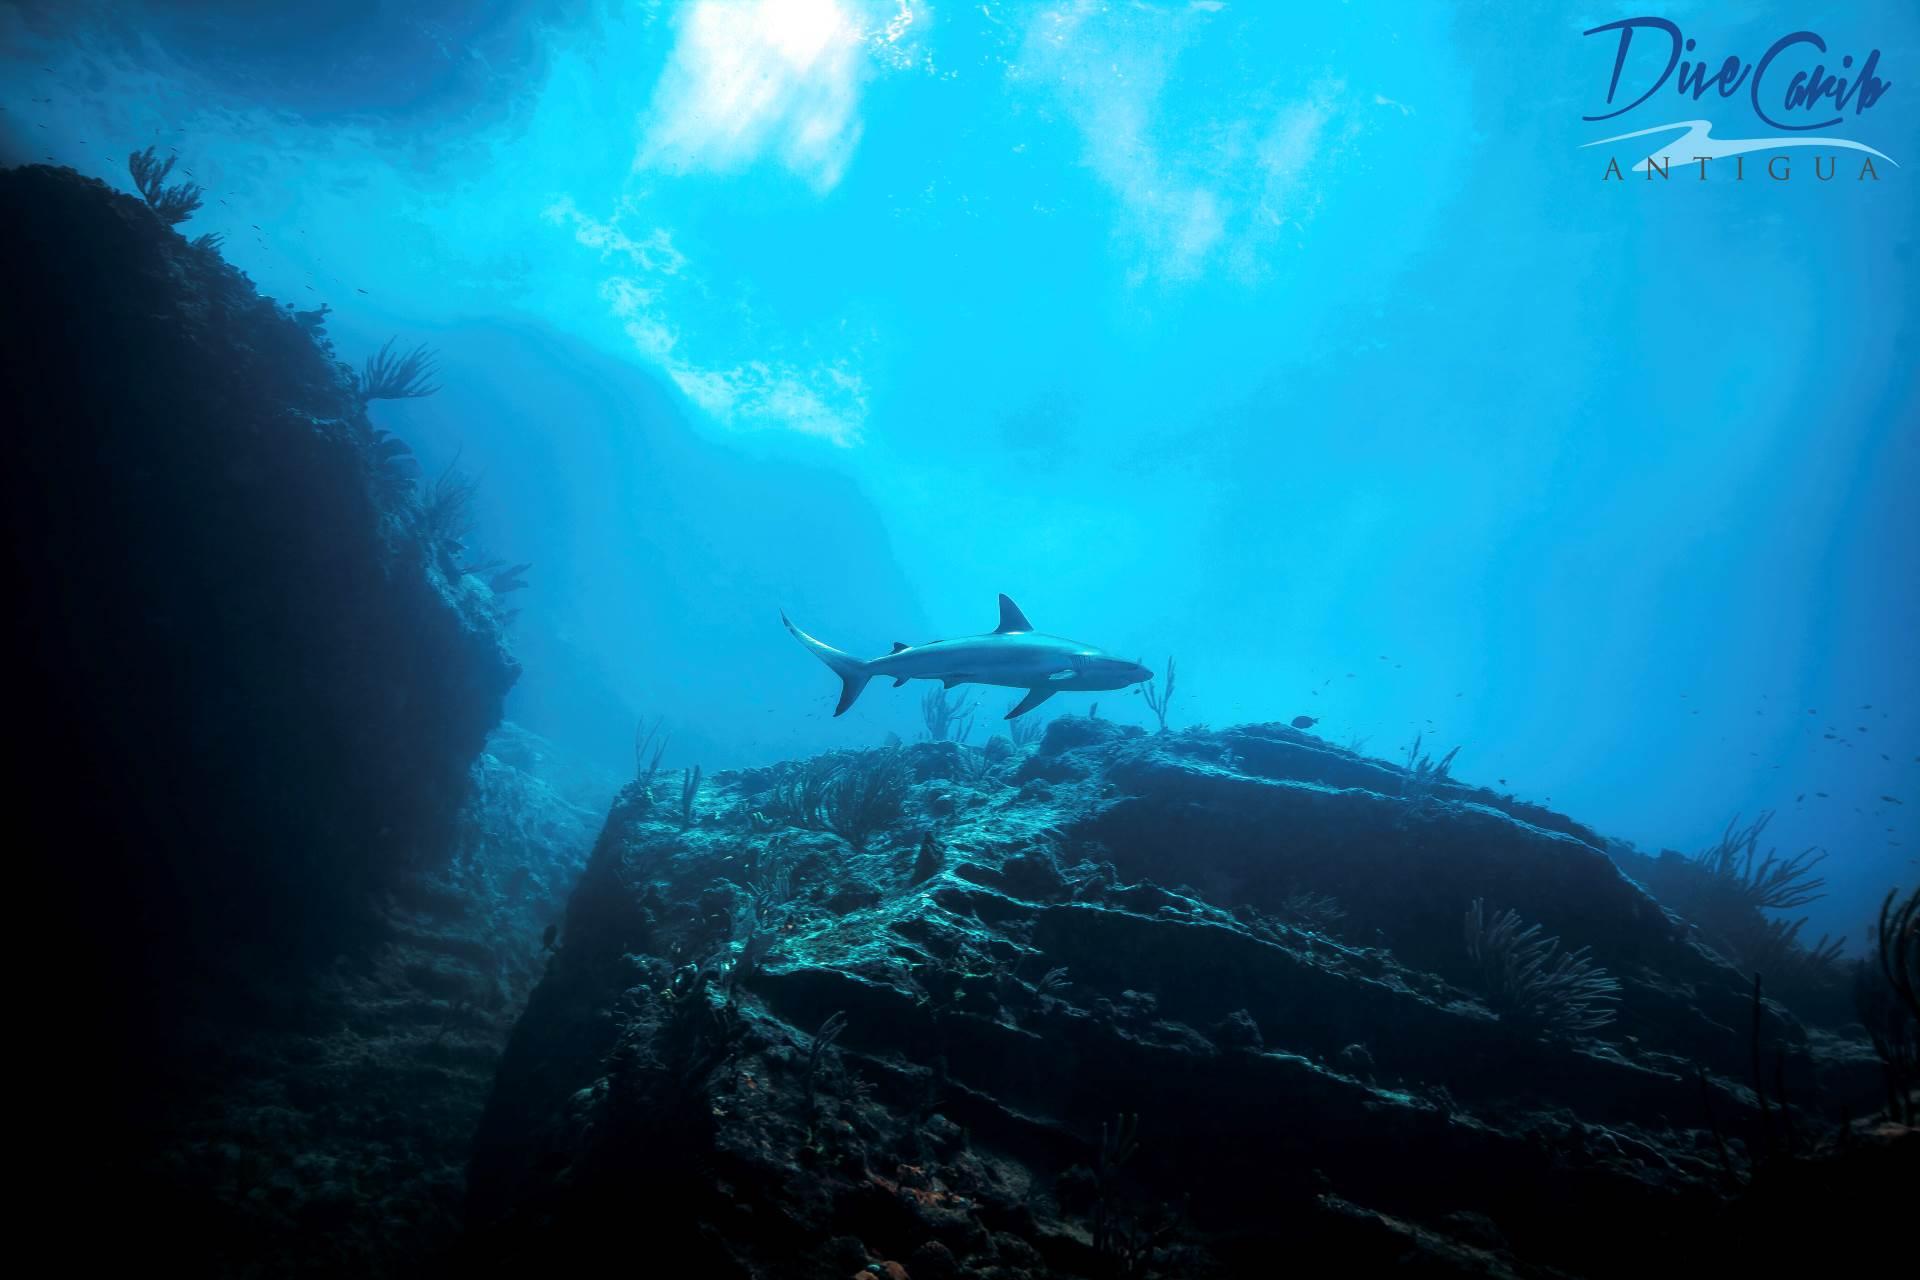 A Caribbean reef shark (Carcharhinus perezii) passing over us at our dive site 'Rolling Stones'. #scuba #padi #divecarib #divecaribbean #antigua #paditv #caribbean #scubadiving #diving #econodeco #antiguaandbarbuda #shark #sharkdiving